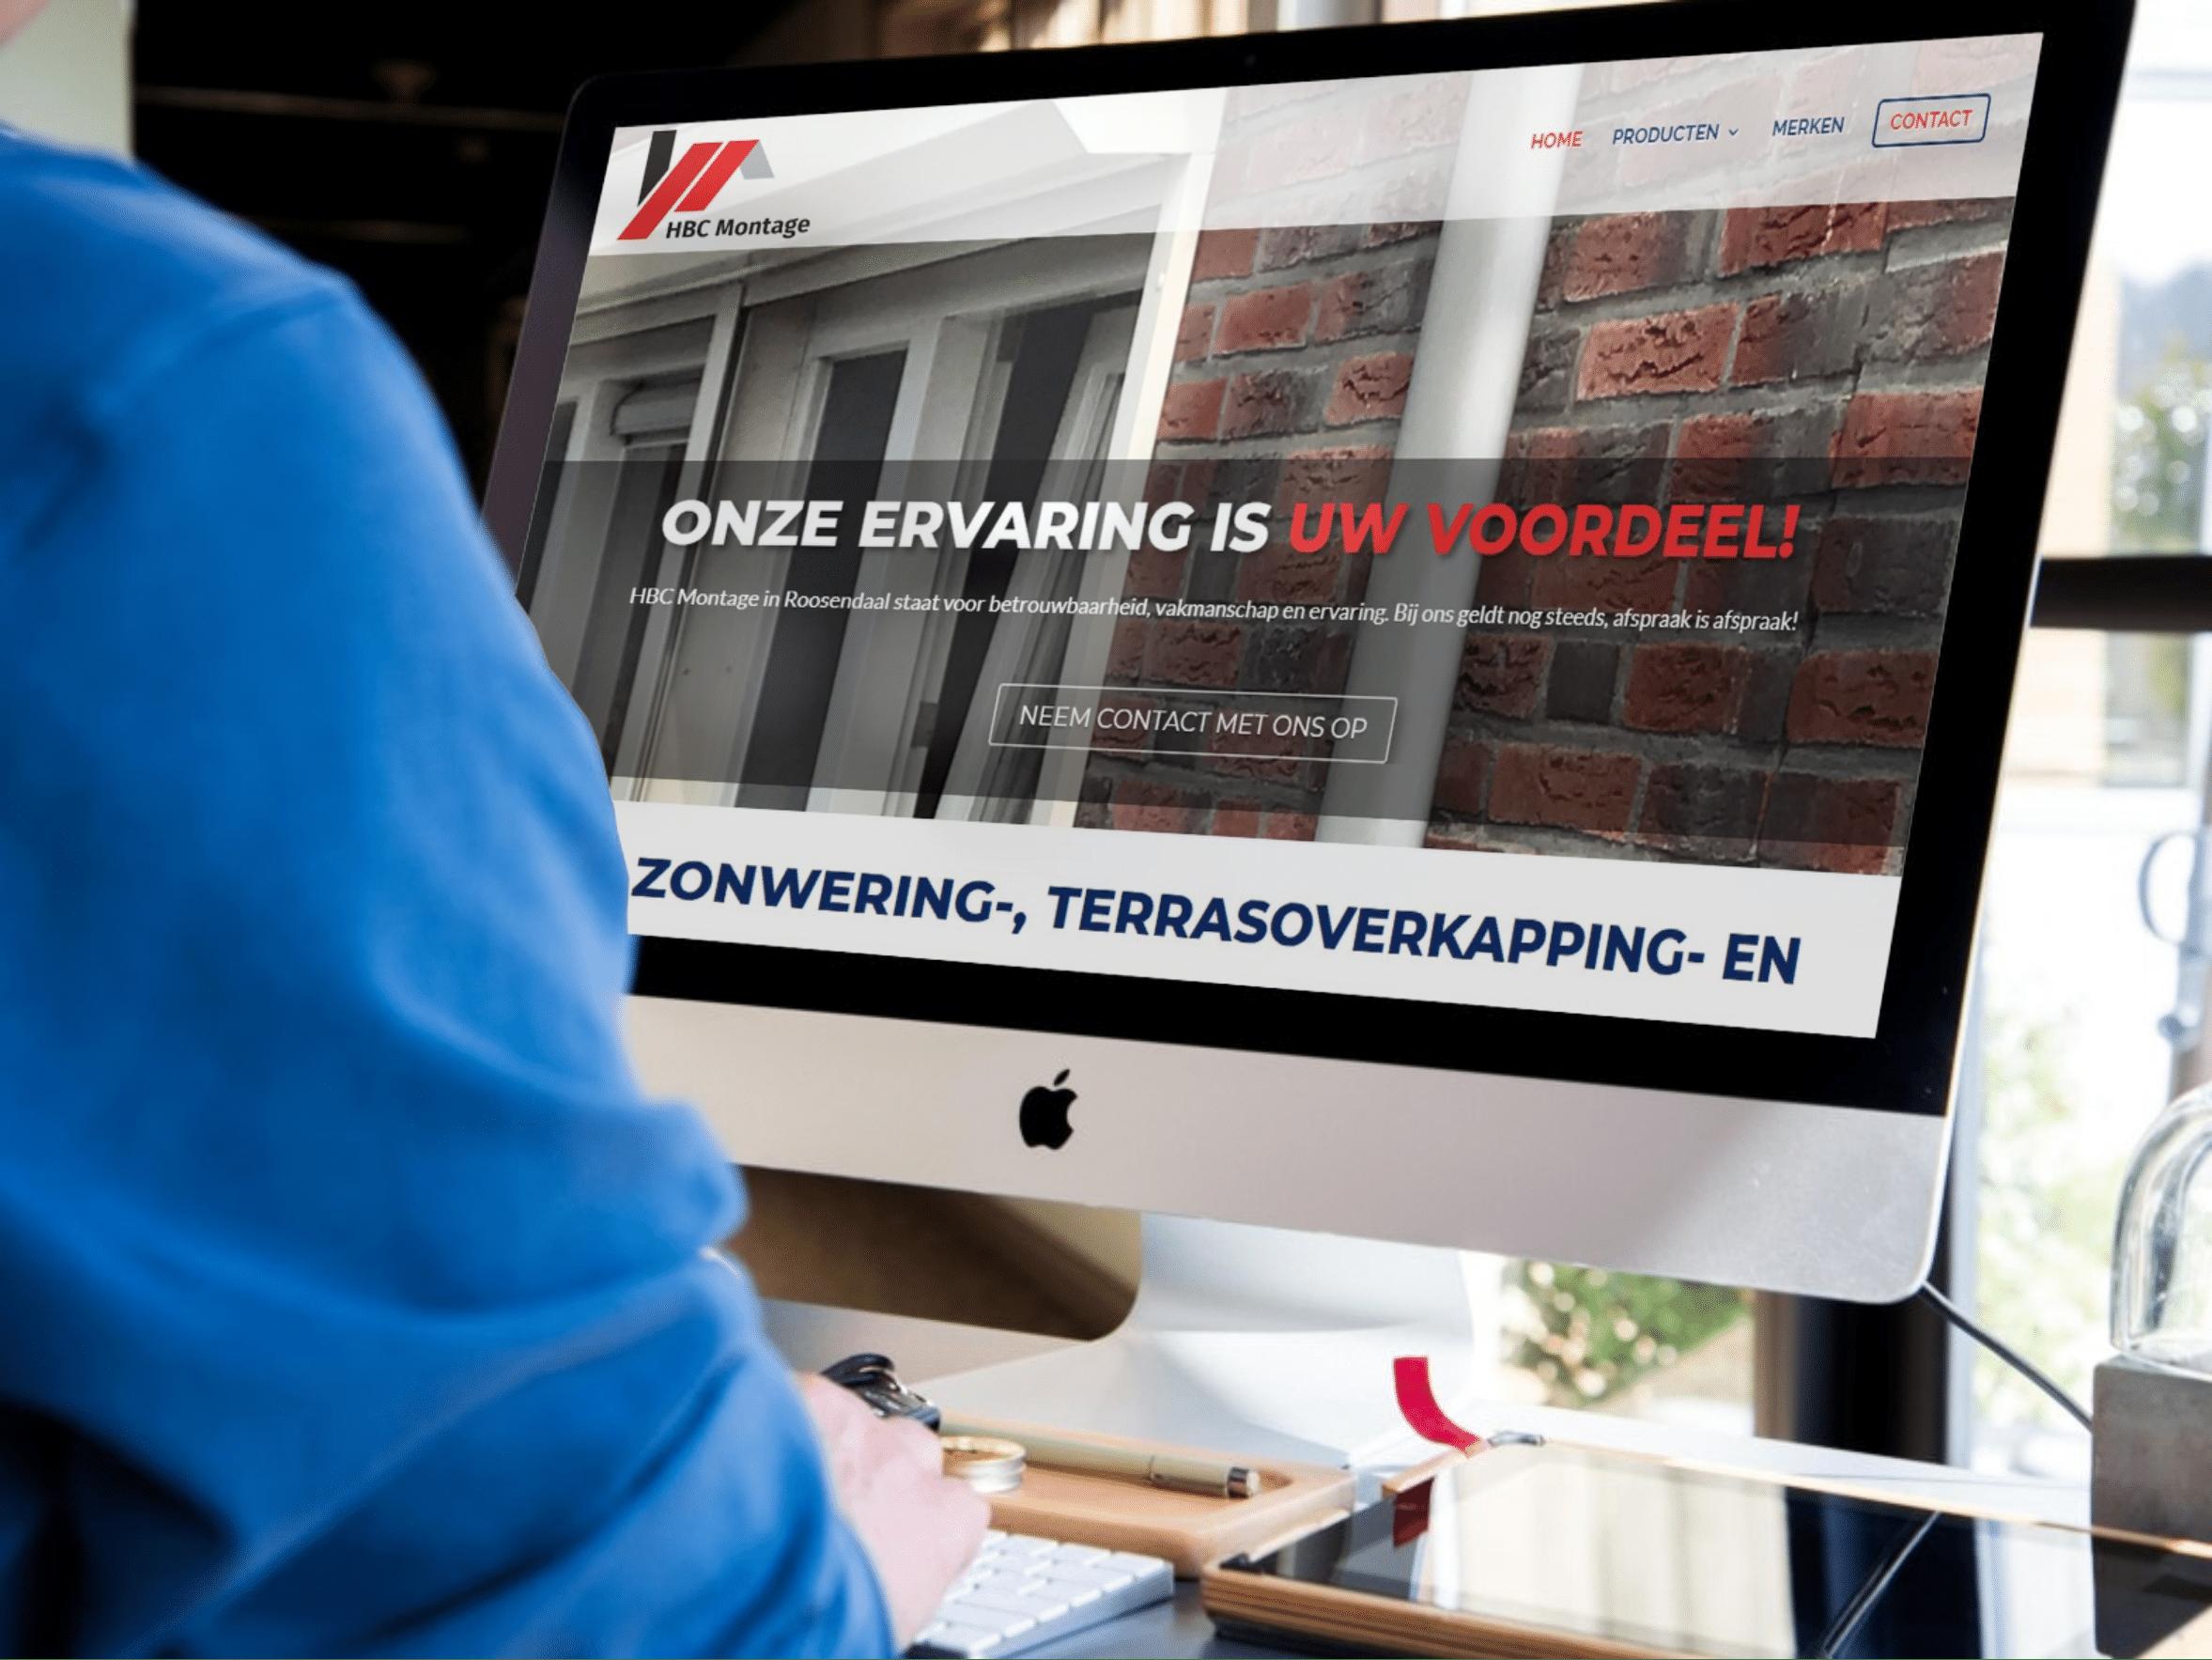 HBS Montage Roosendaal